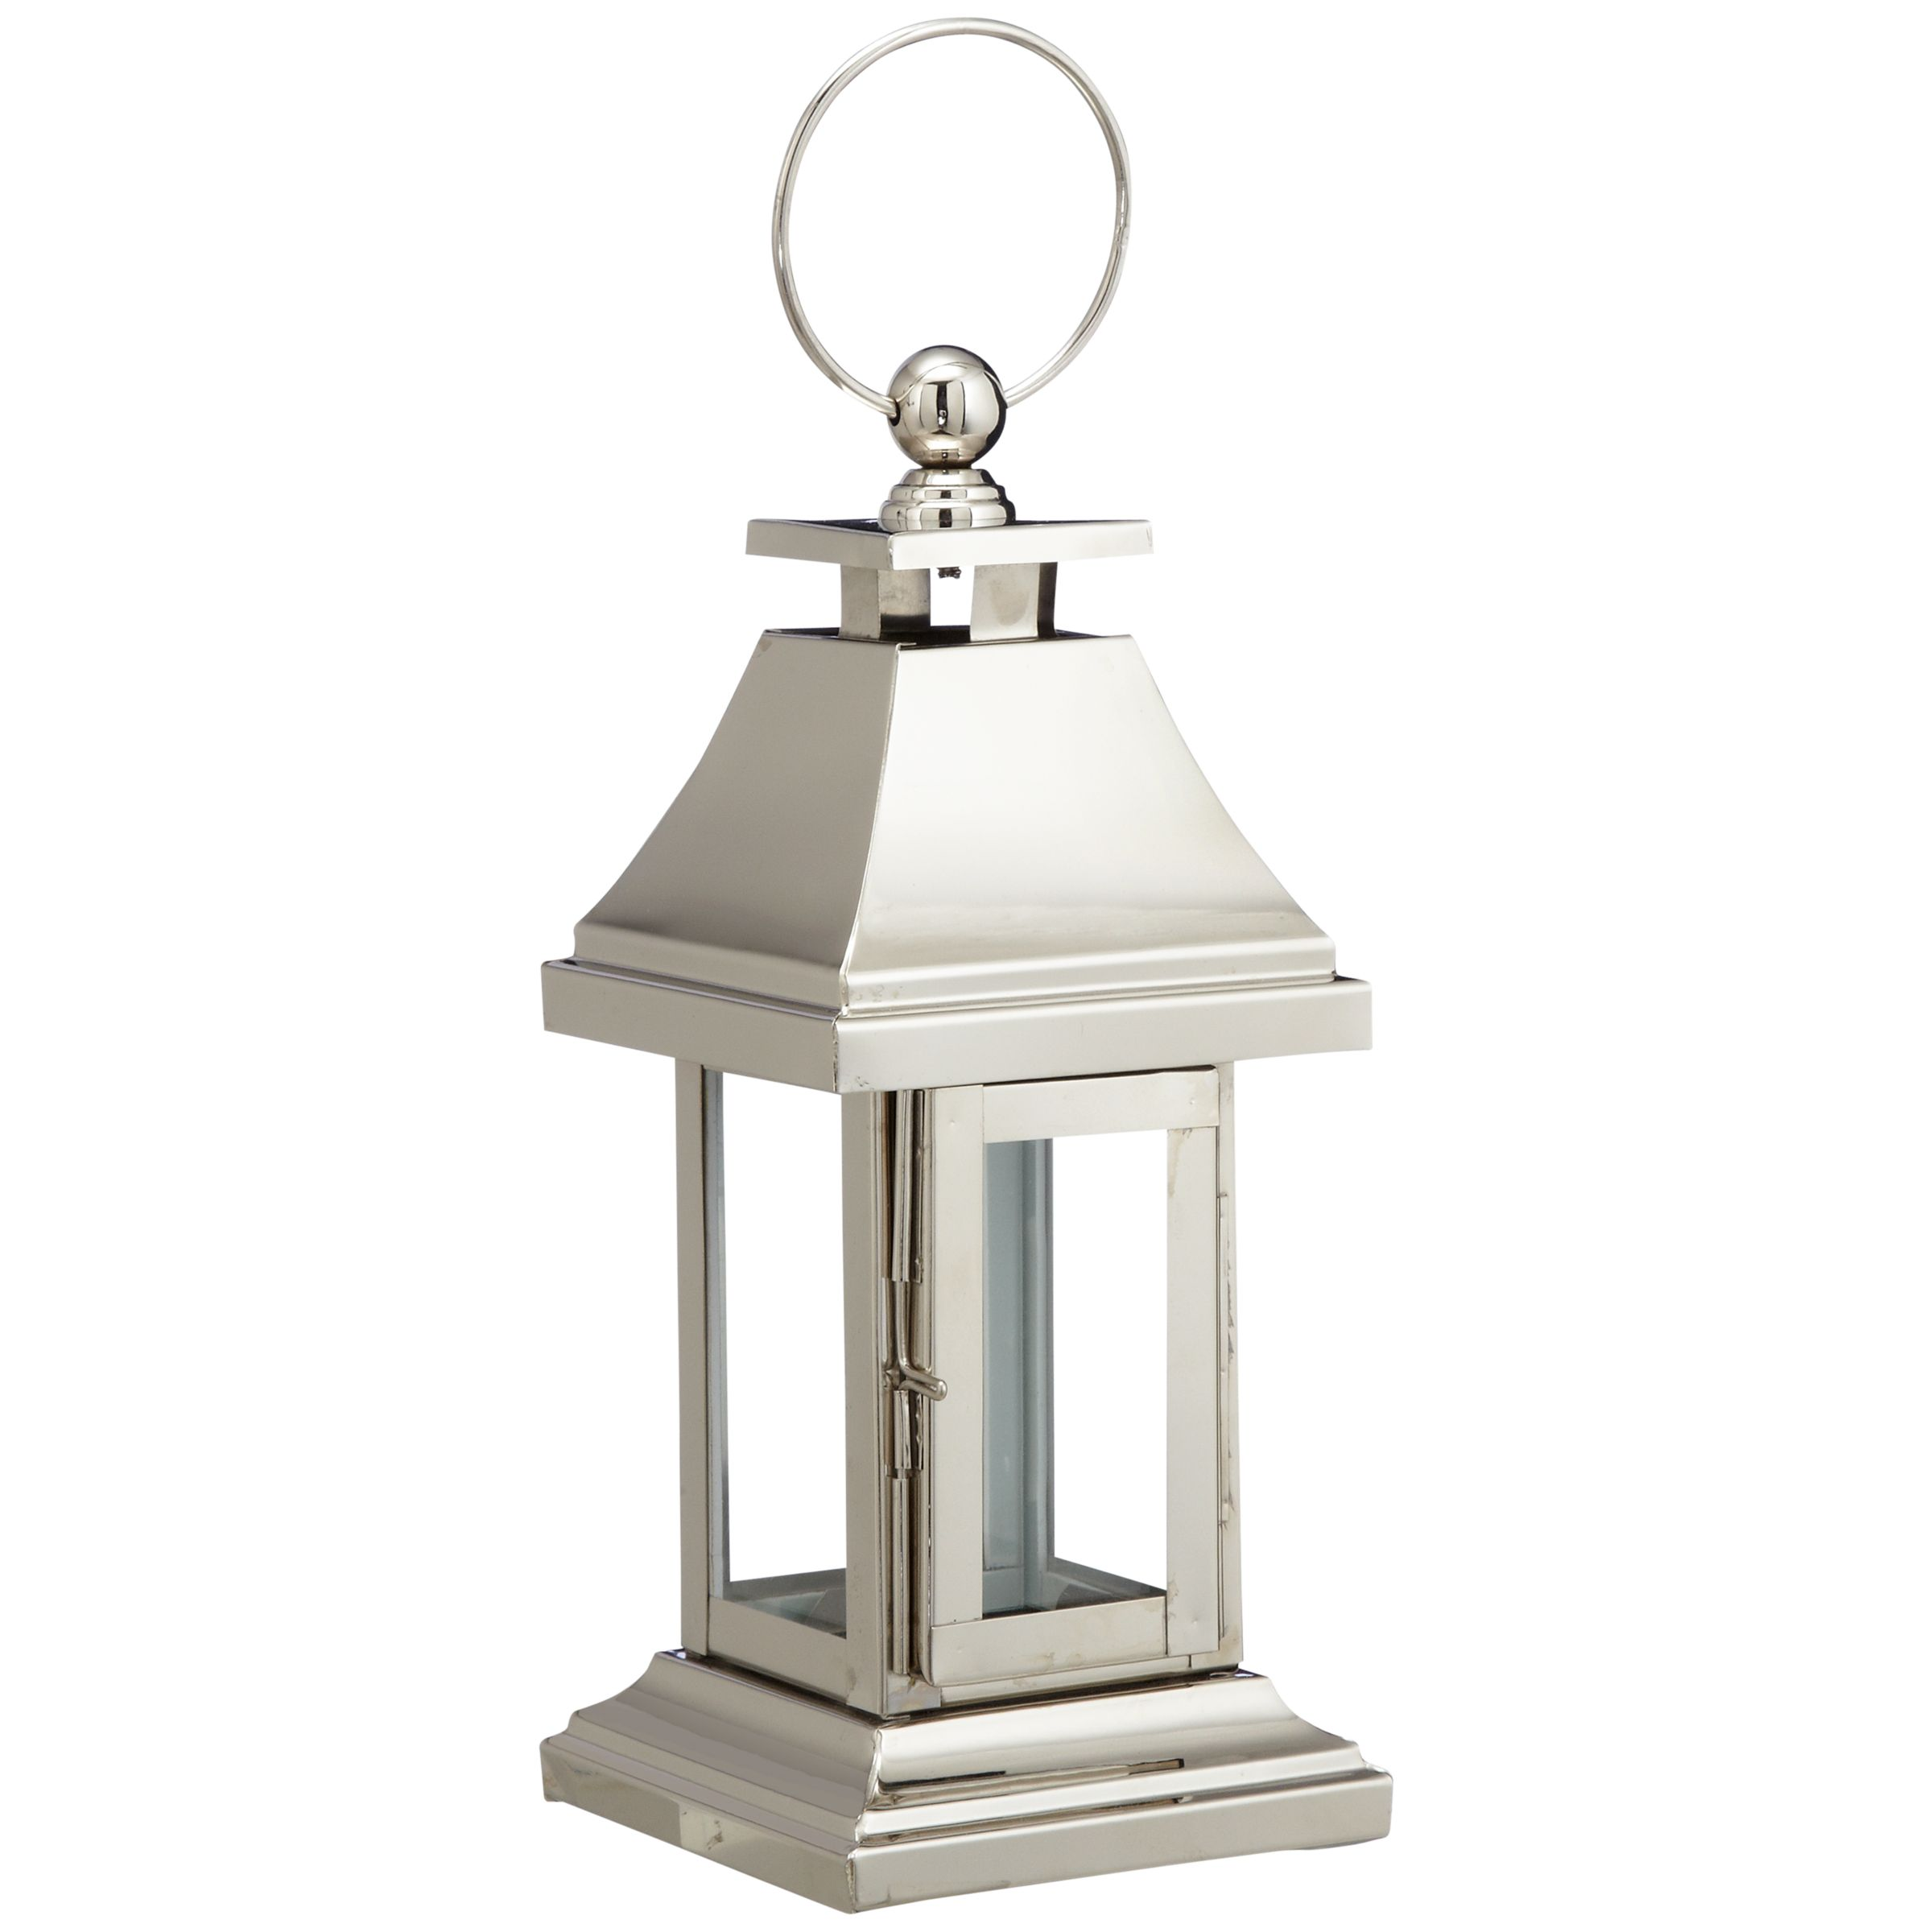 John Lewis Victoria Lantern, H30cm